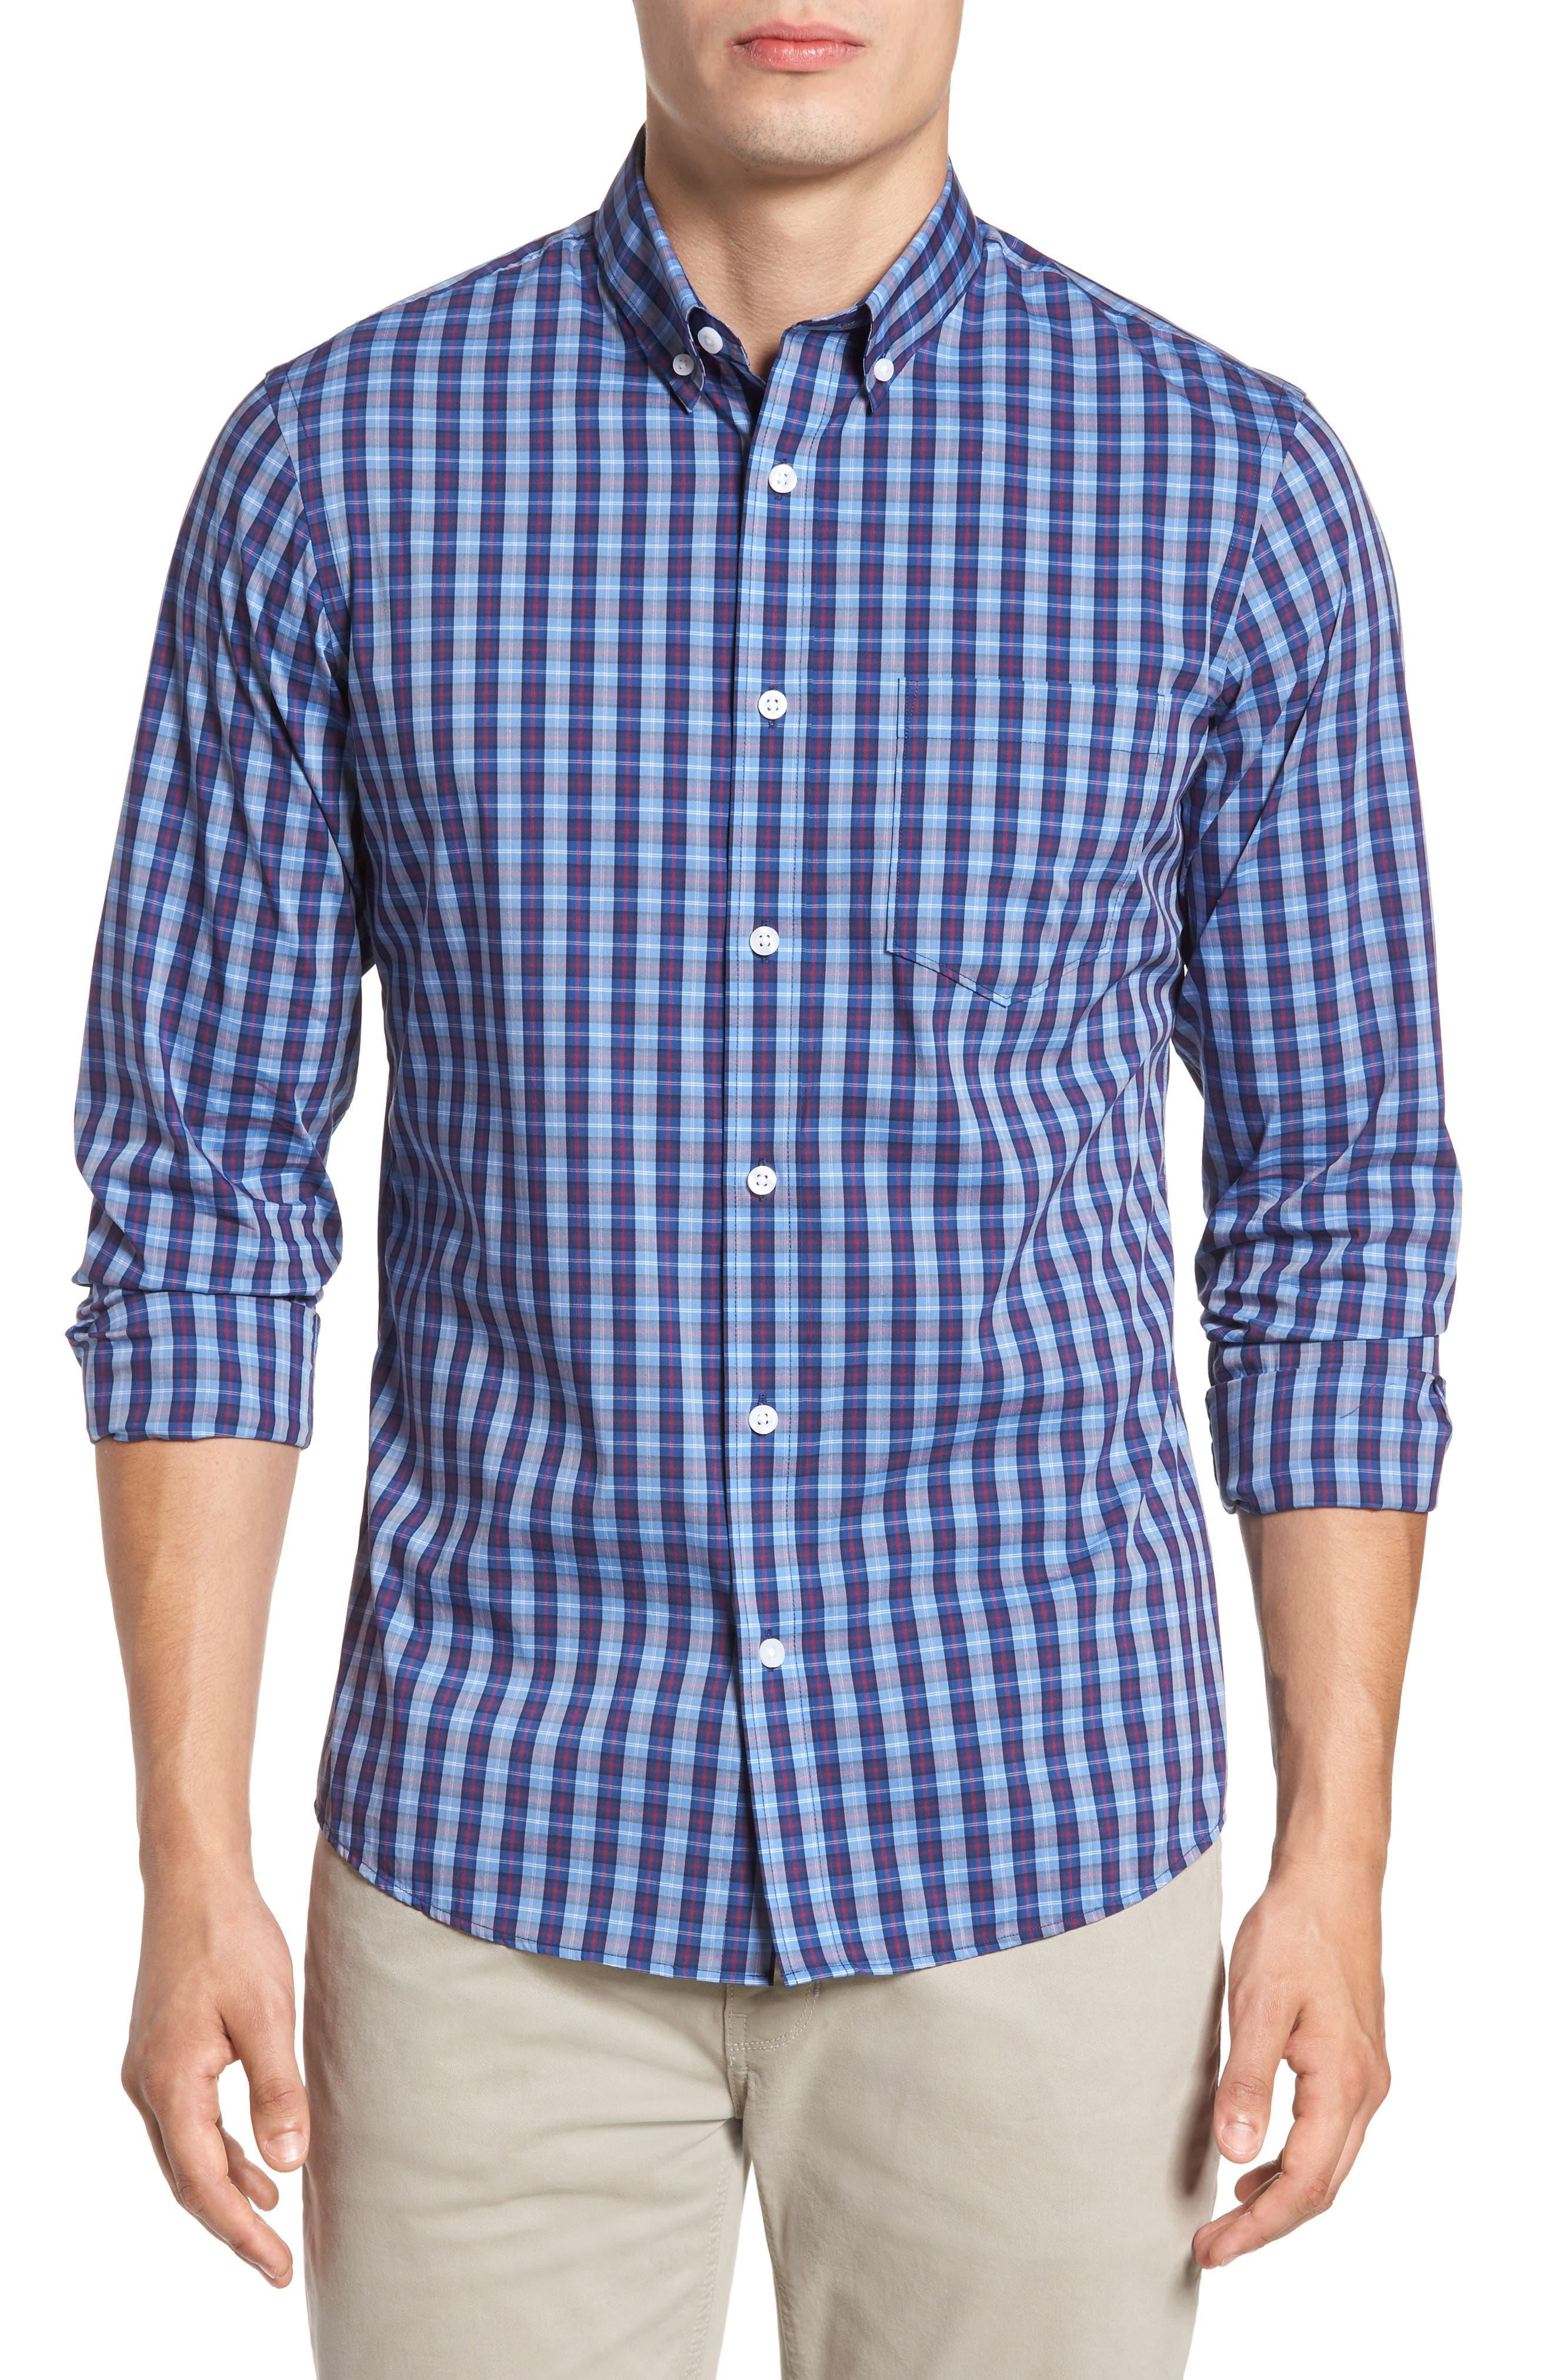 Alternate Image 1 Selected - Nordstrom Men's Shop Trim Fit Tech-Smart Plaid Sport Shirt (Regular & Tall)